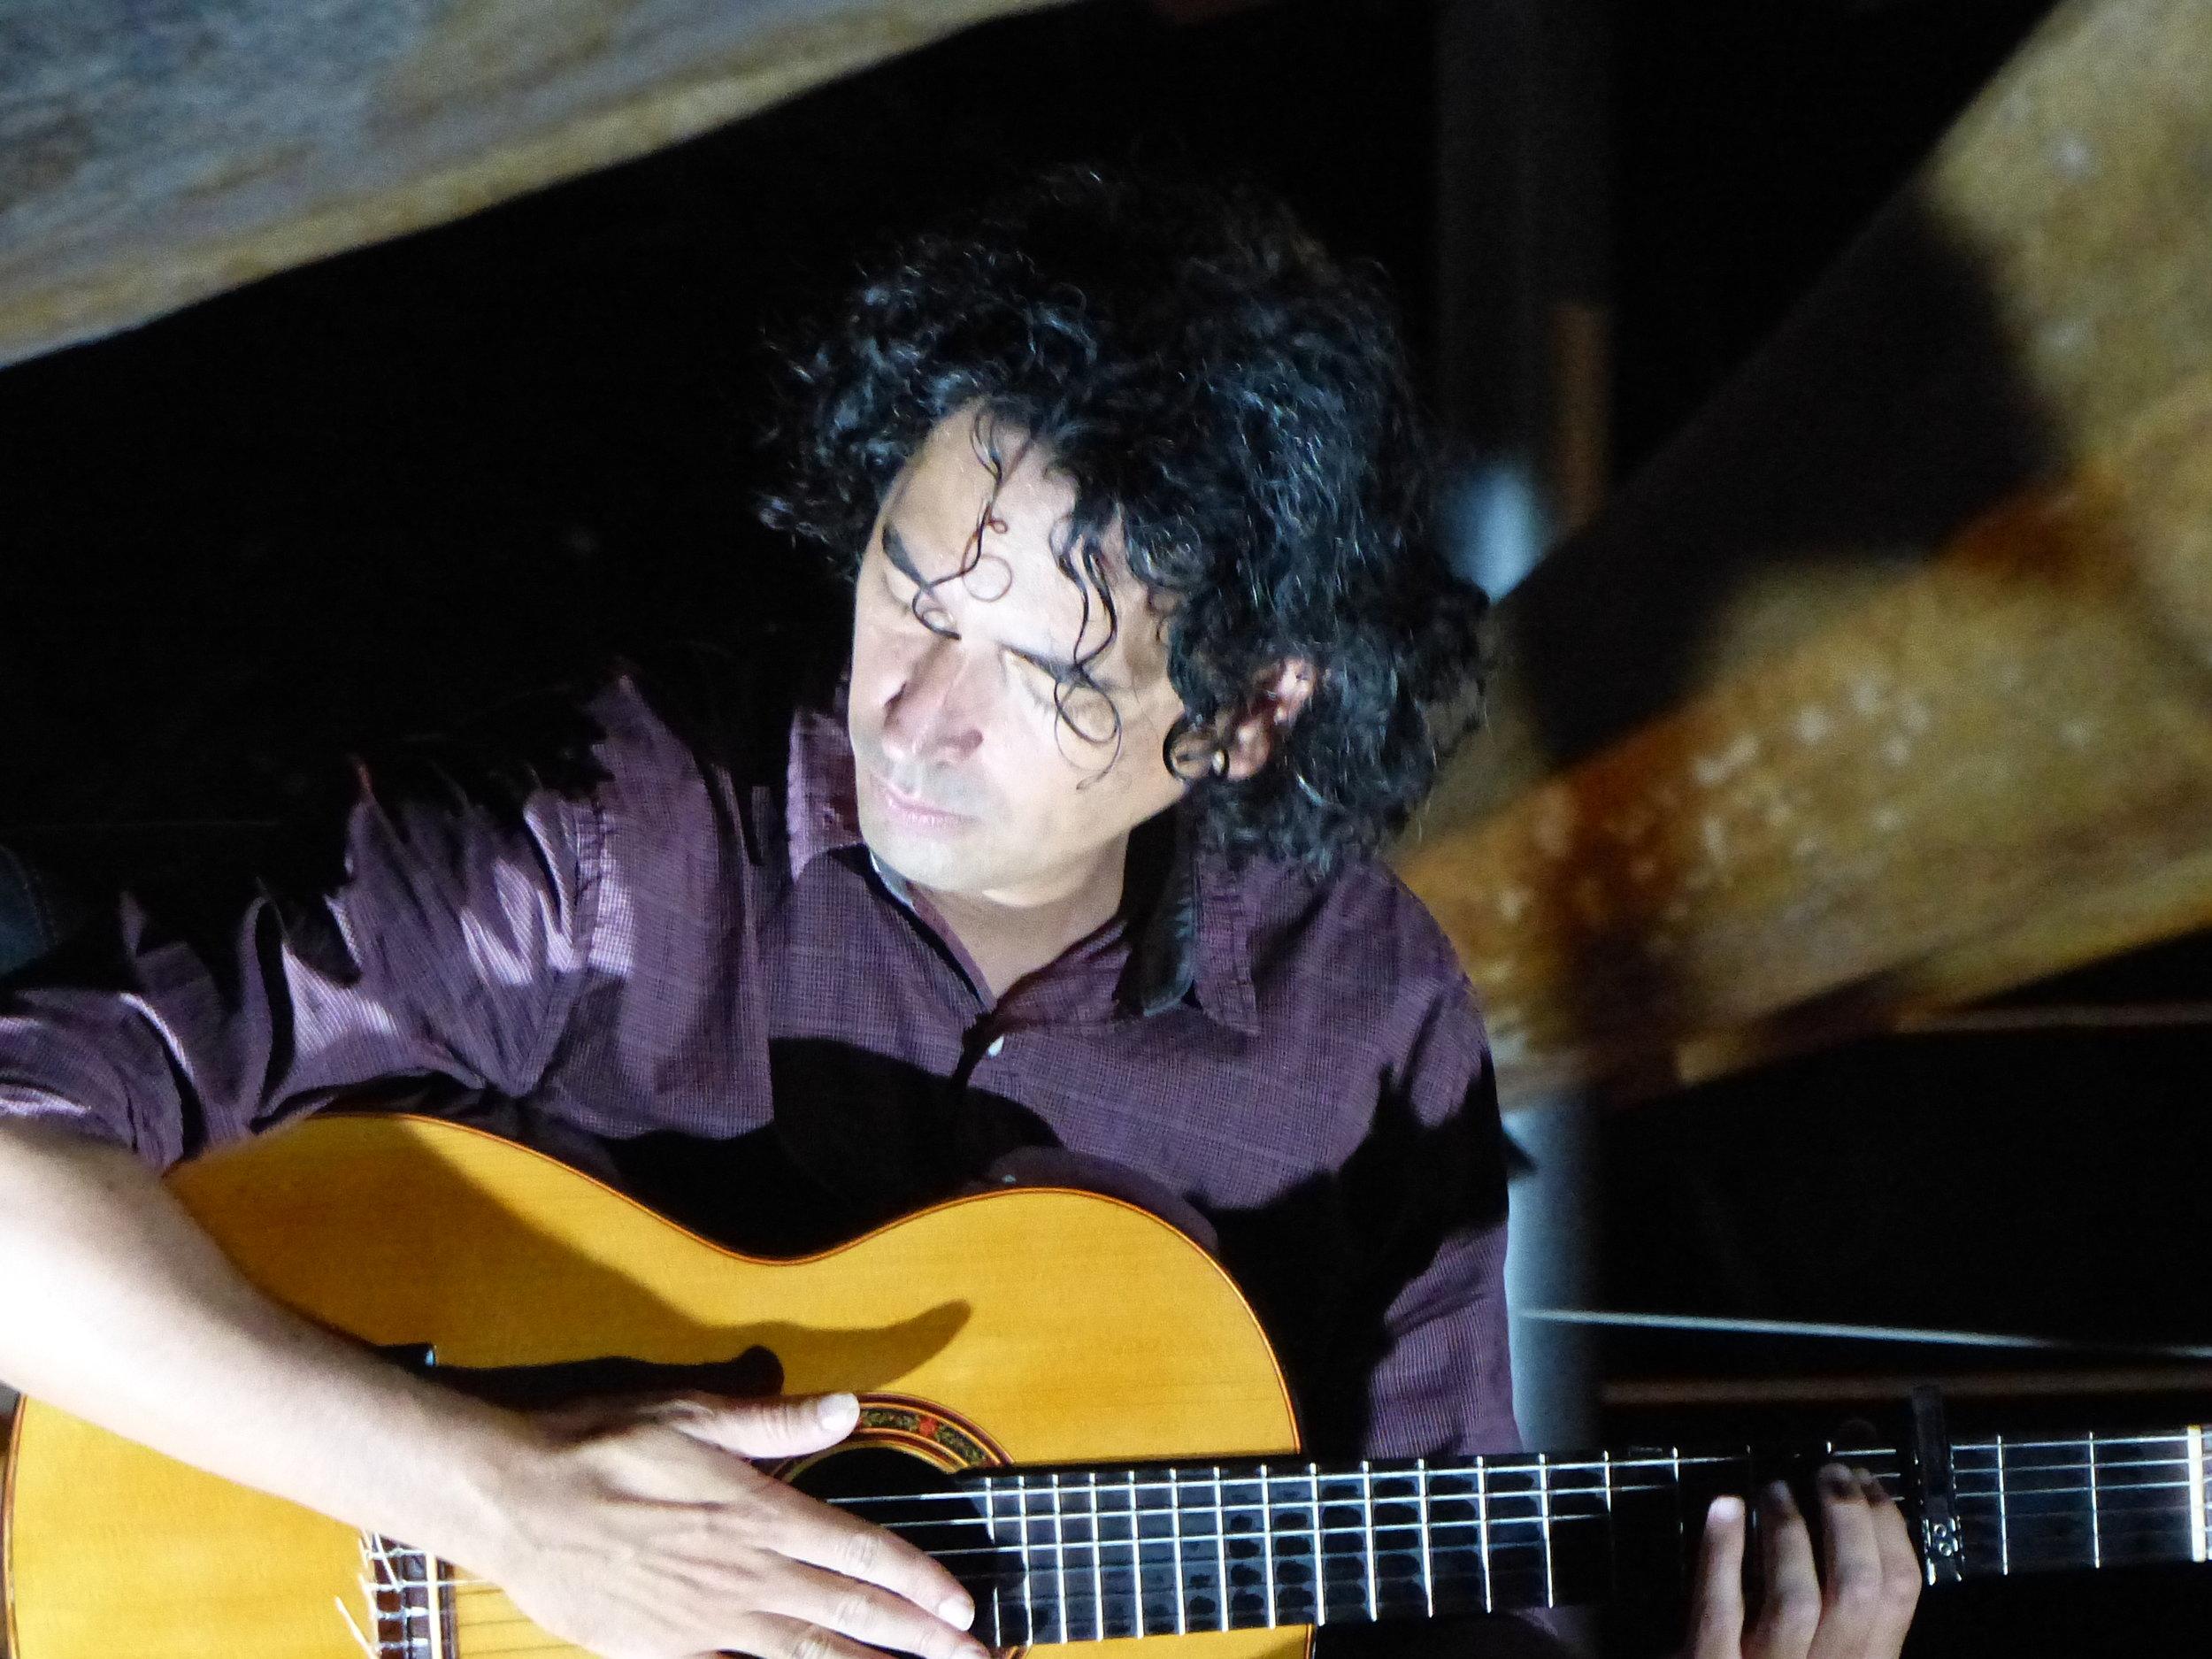 Josue Tacoronte Otero. Cuba/Mexico